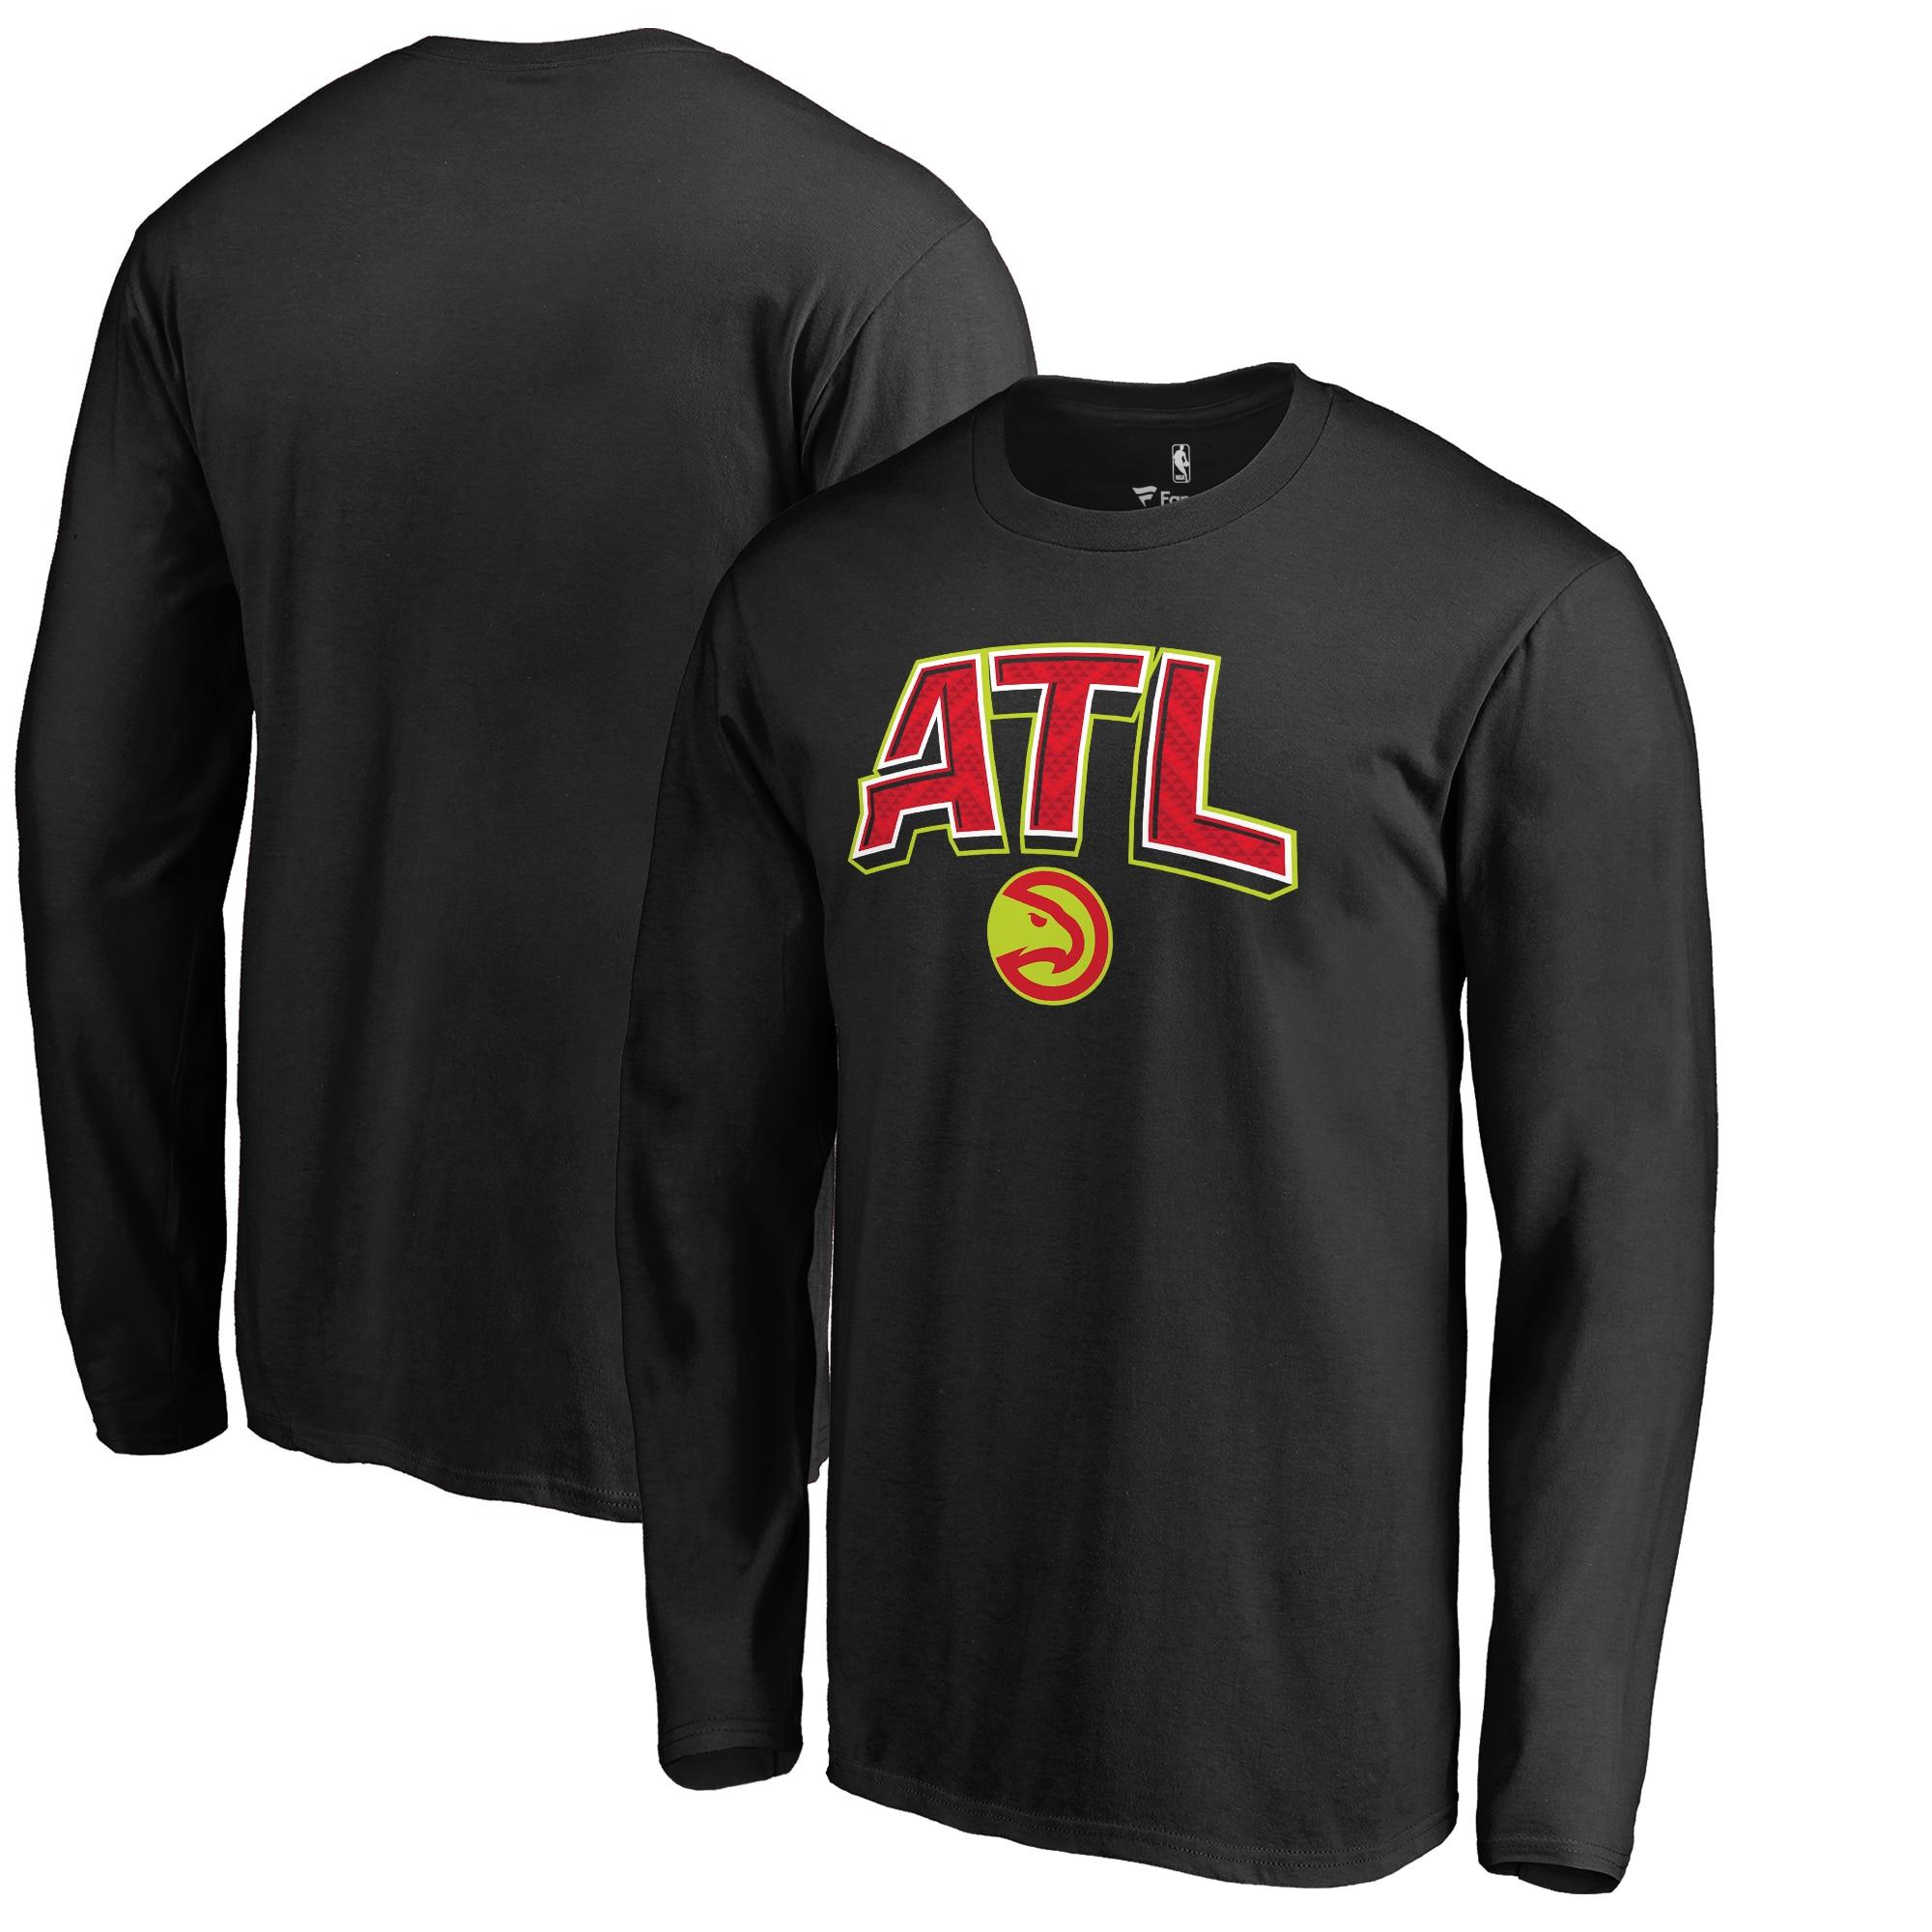 Atlanta Hawks Fanatics Branded ATL Hometown Collection Long Sleeve T-Shirt - Black